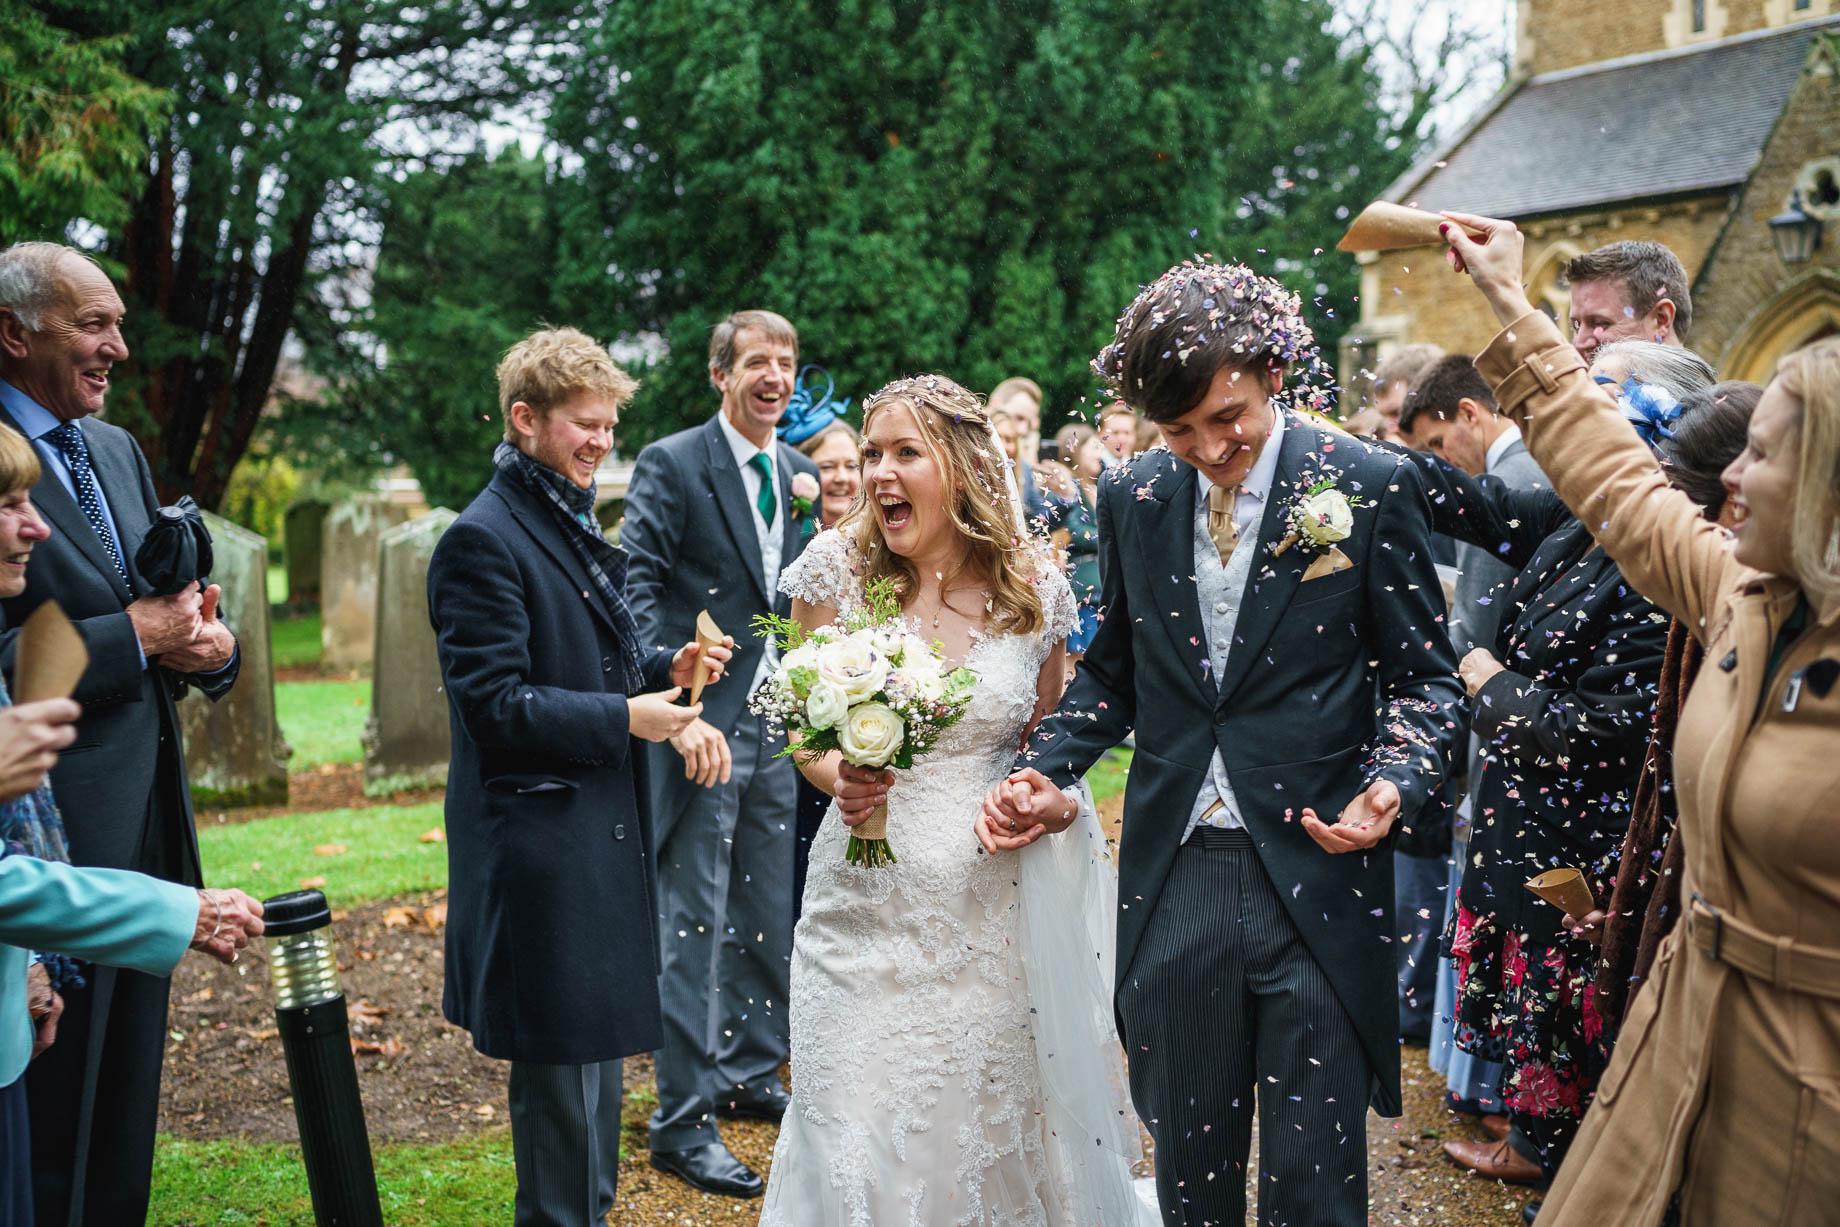 Gate Street Barn wedding photography - Susie + James